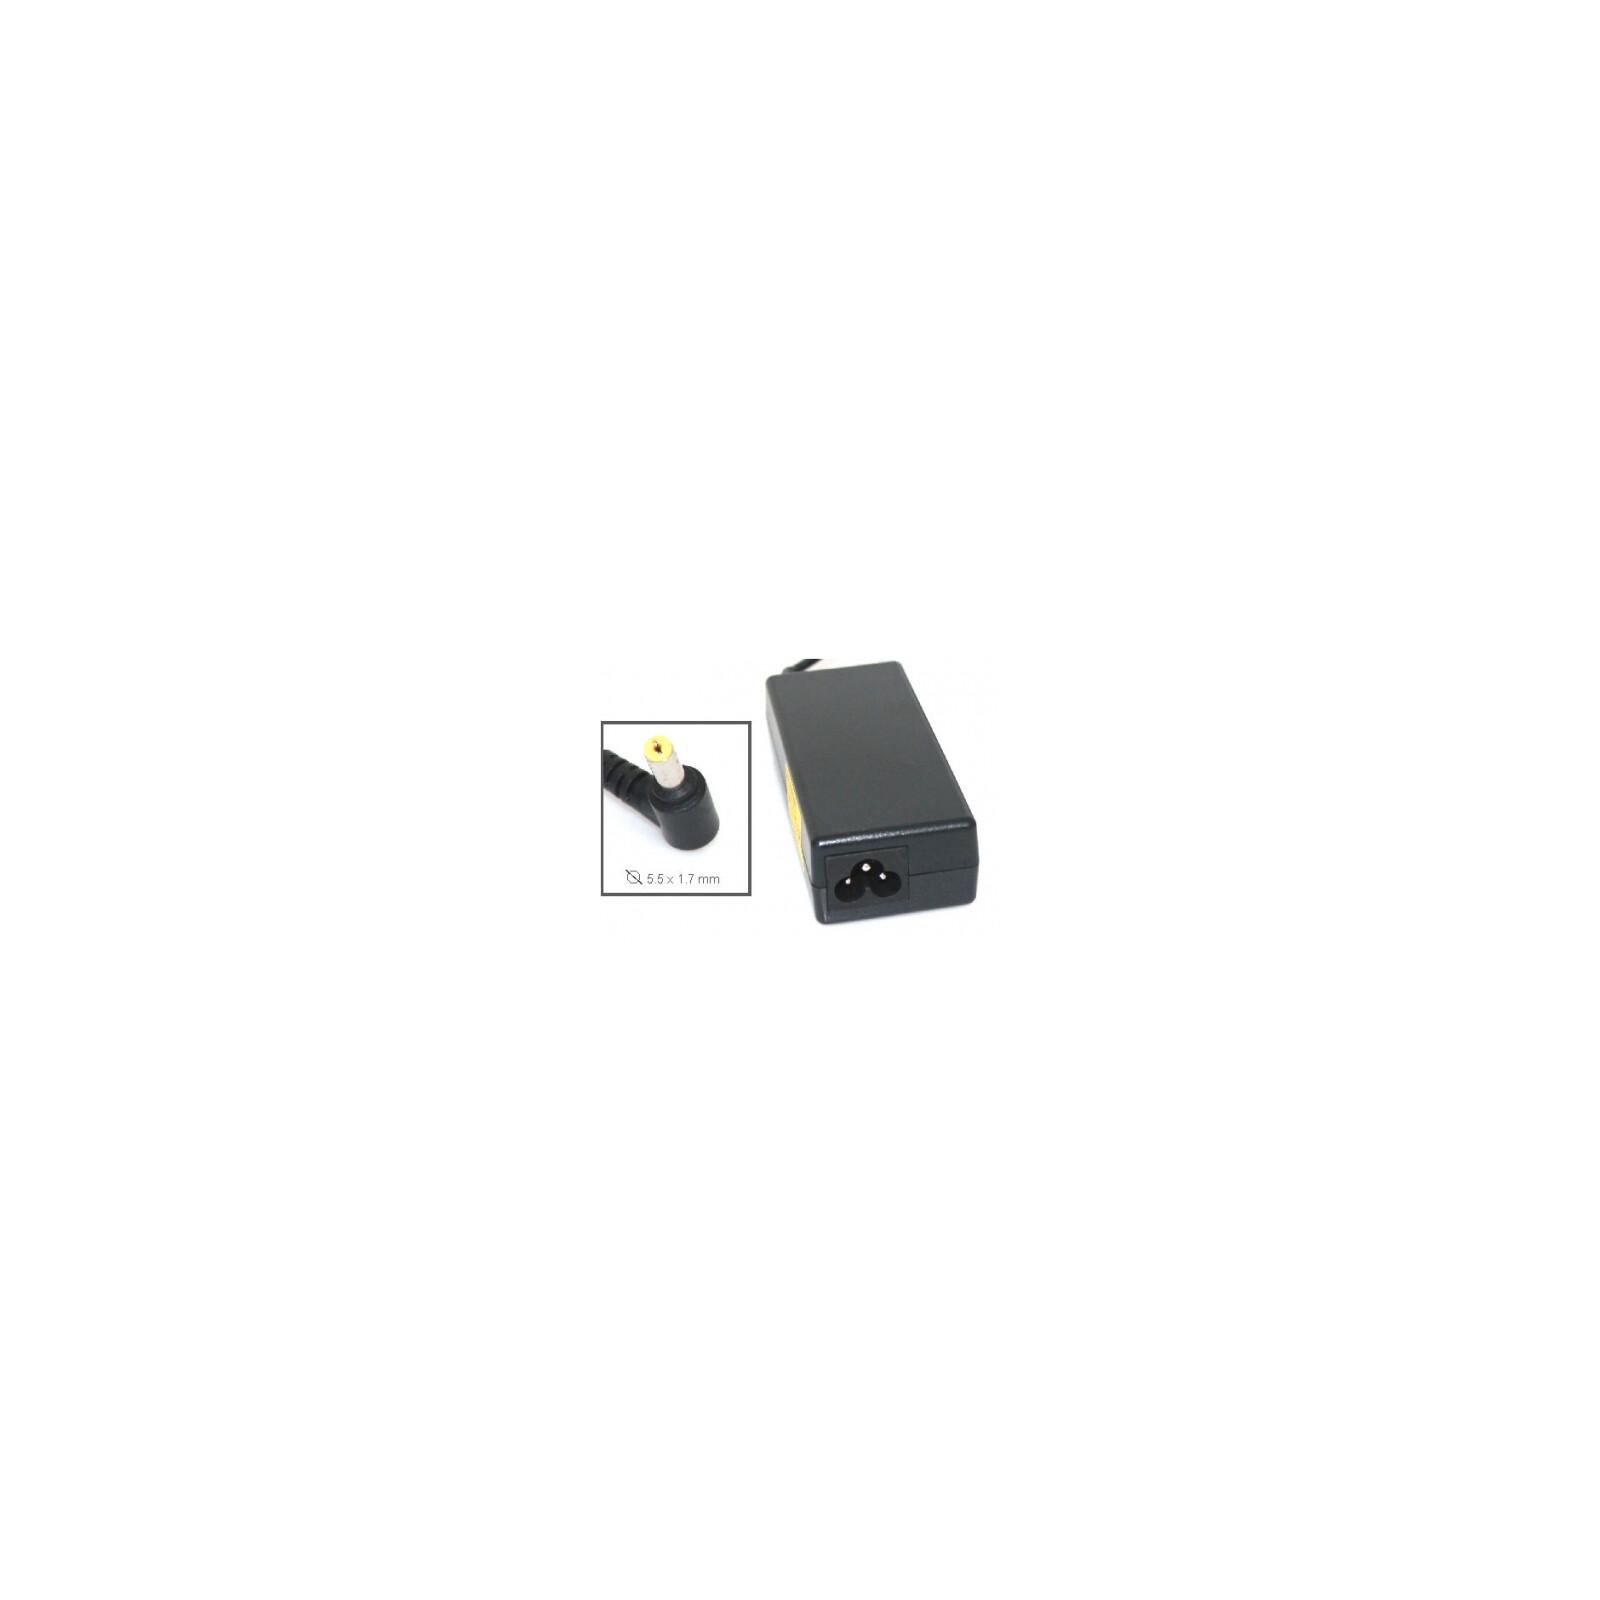 Acer 93701 Original Netzteil TM 5735